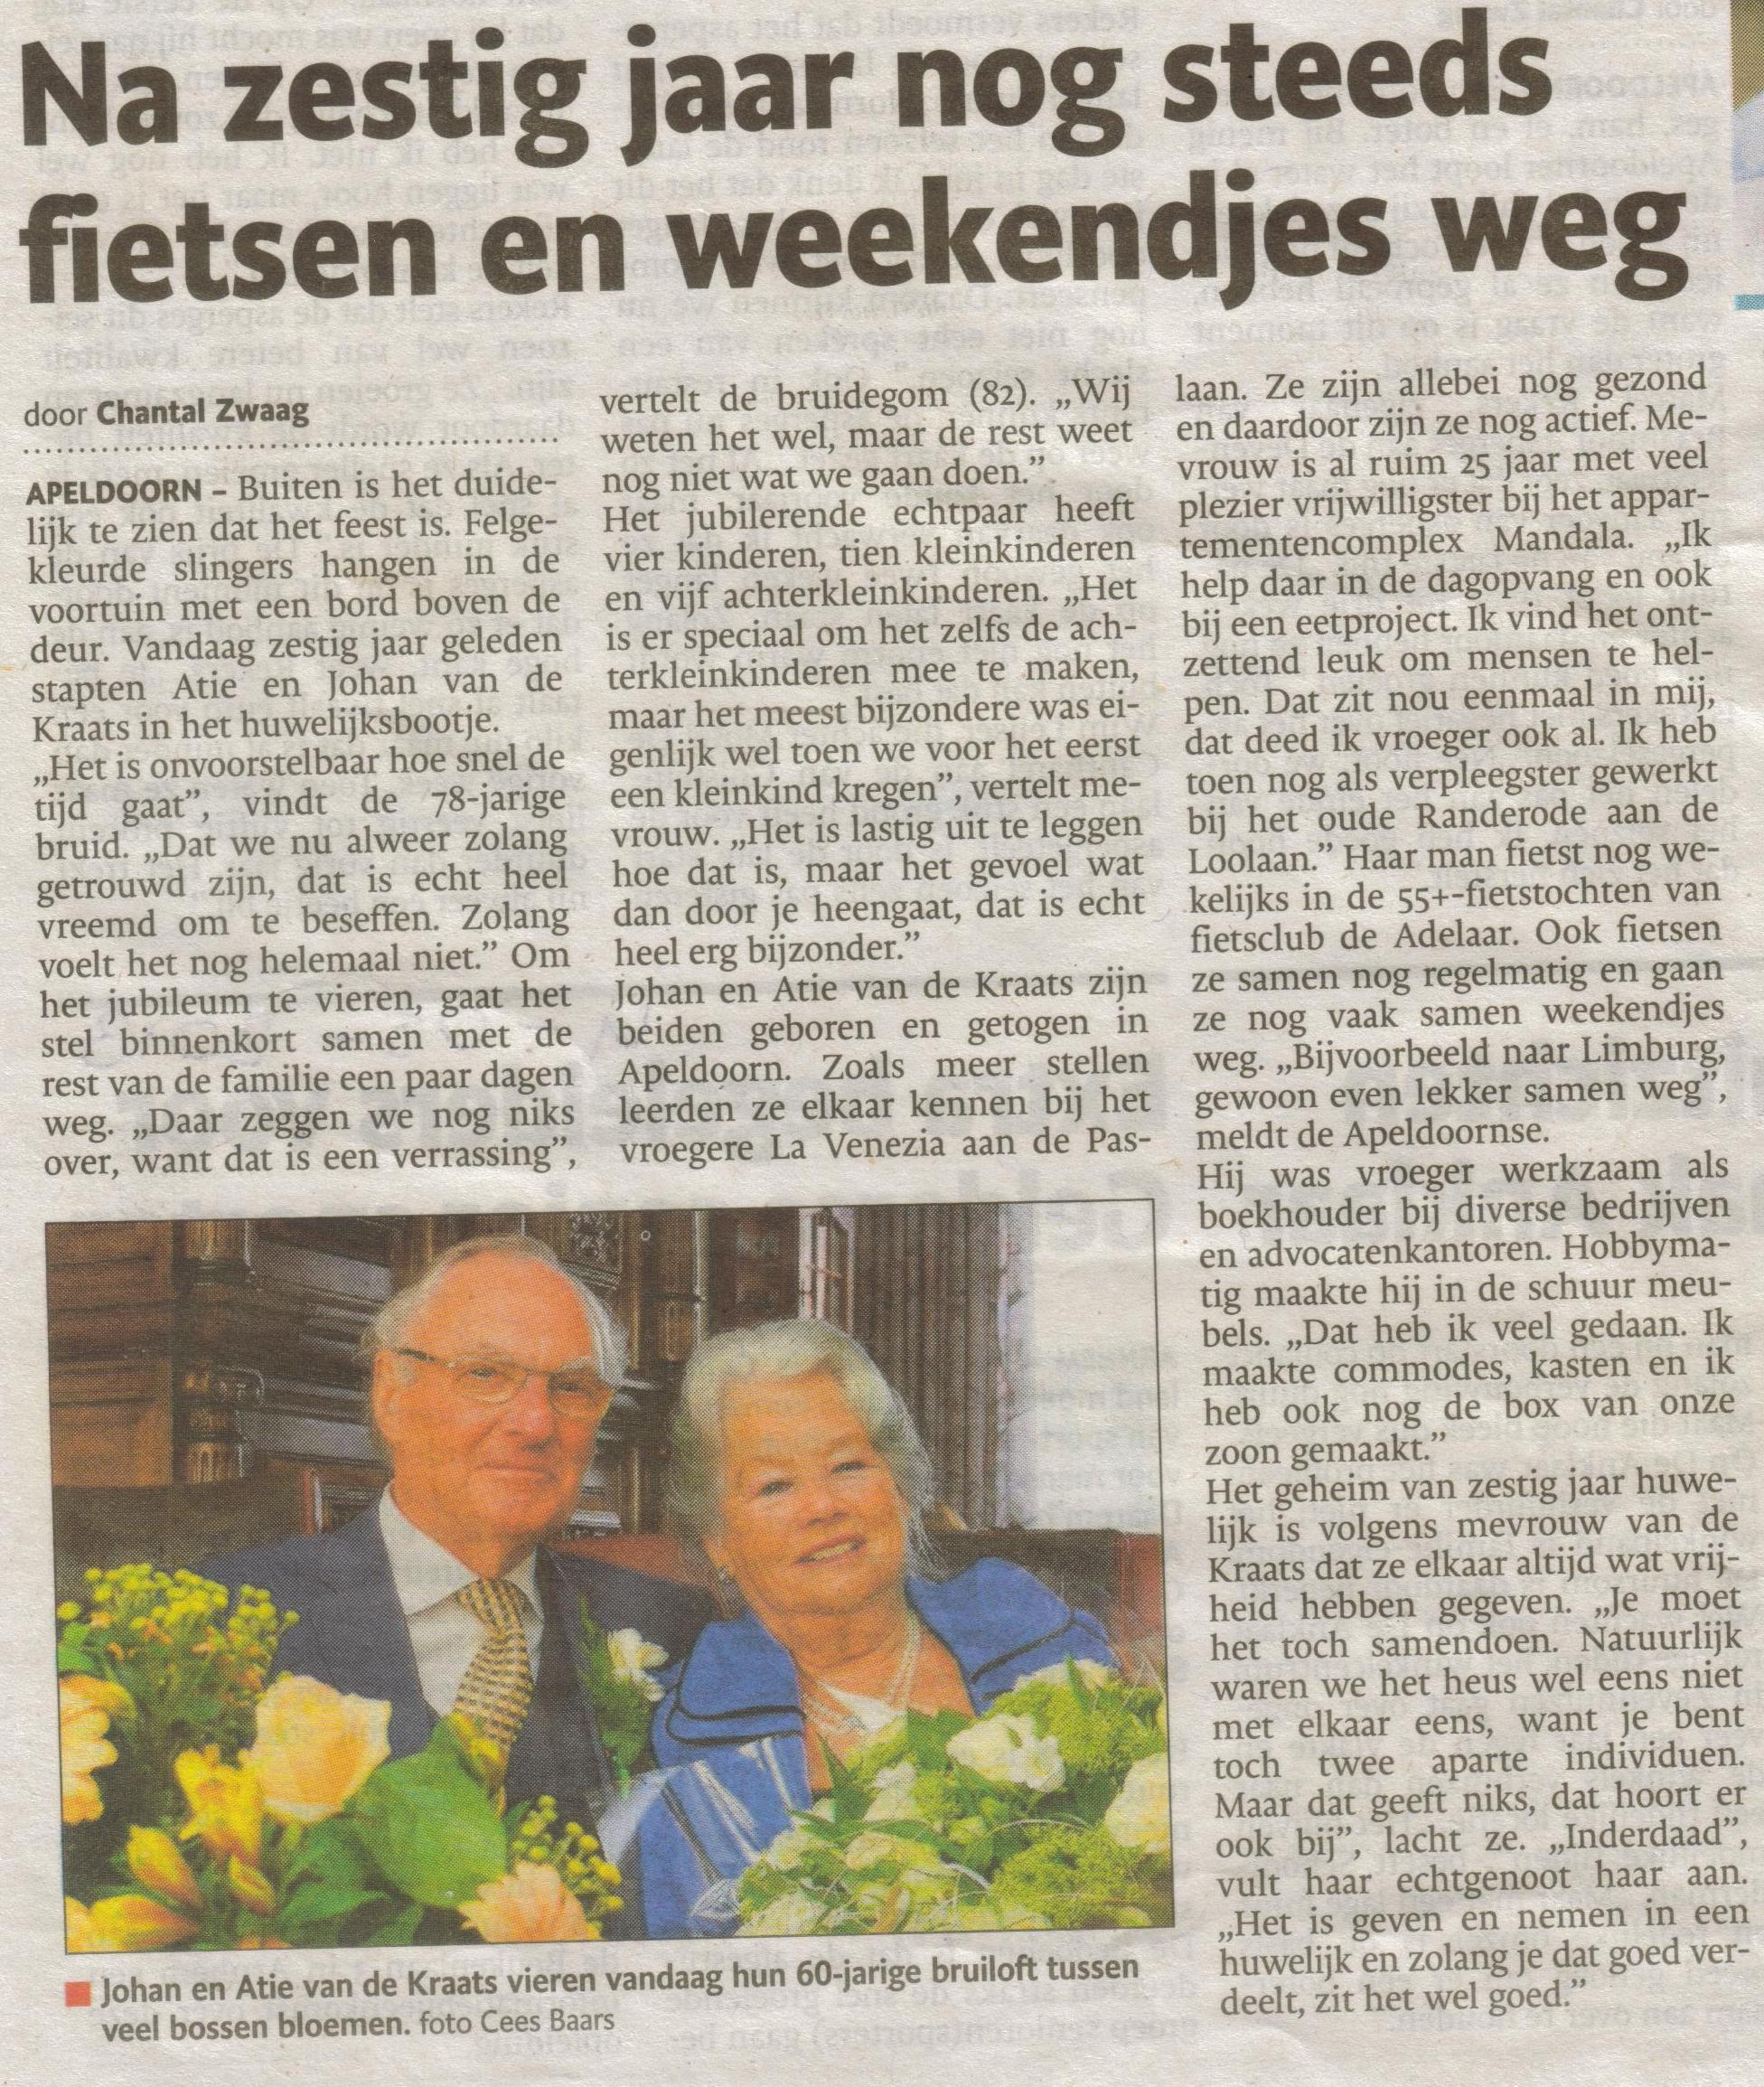 3- fam. v.d.kraats 60 jr getrouwd-publicatiedatum 4 mei 2013